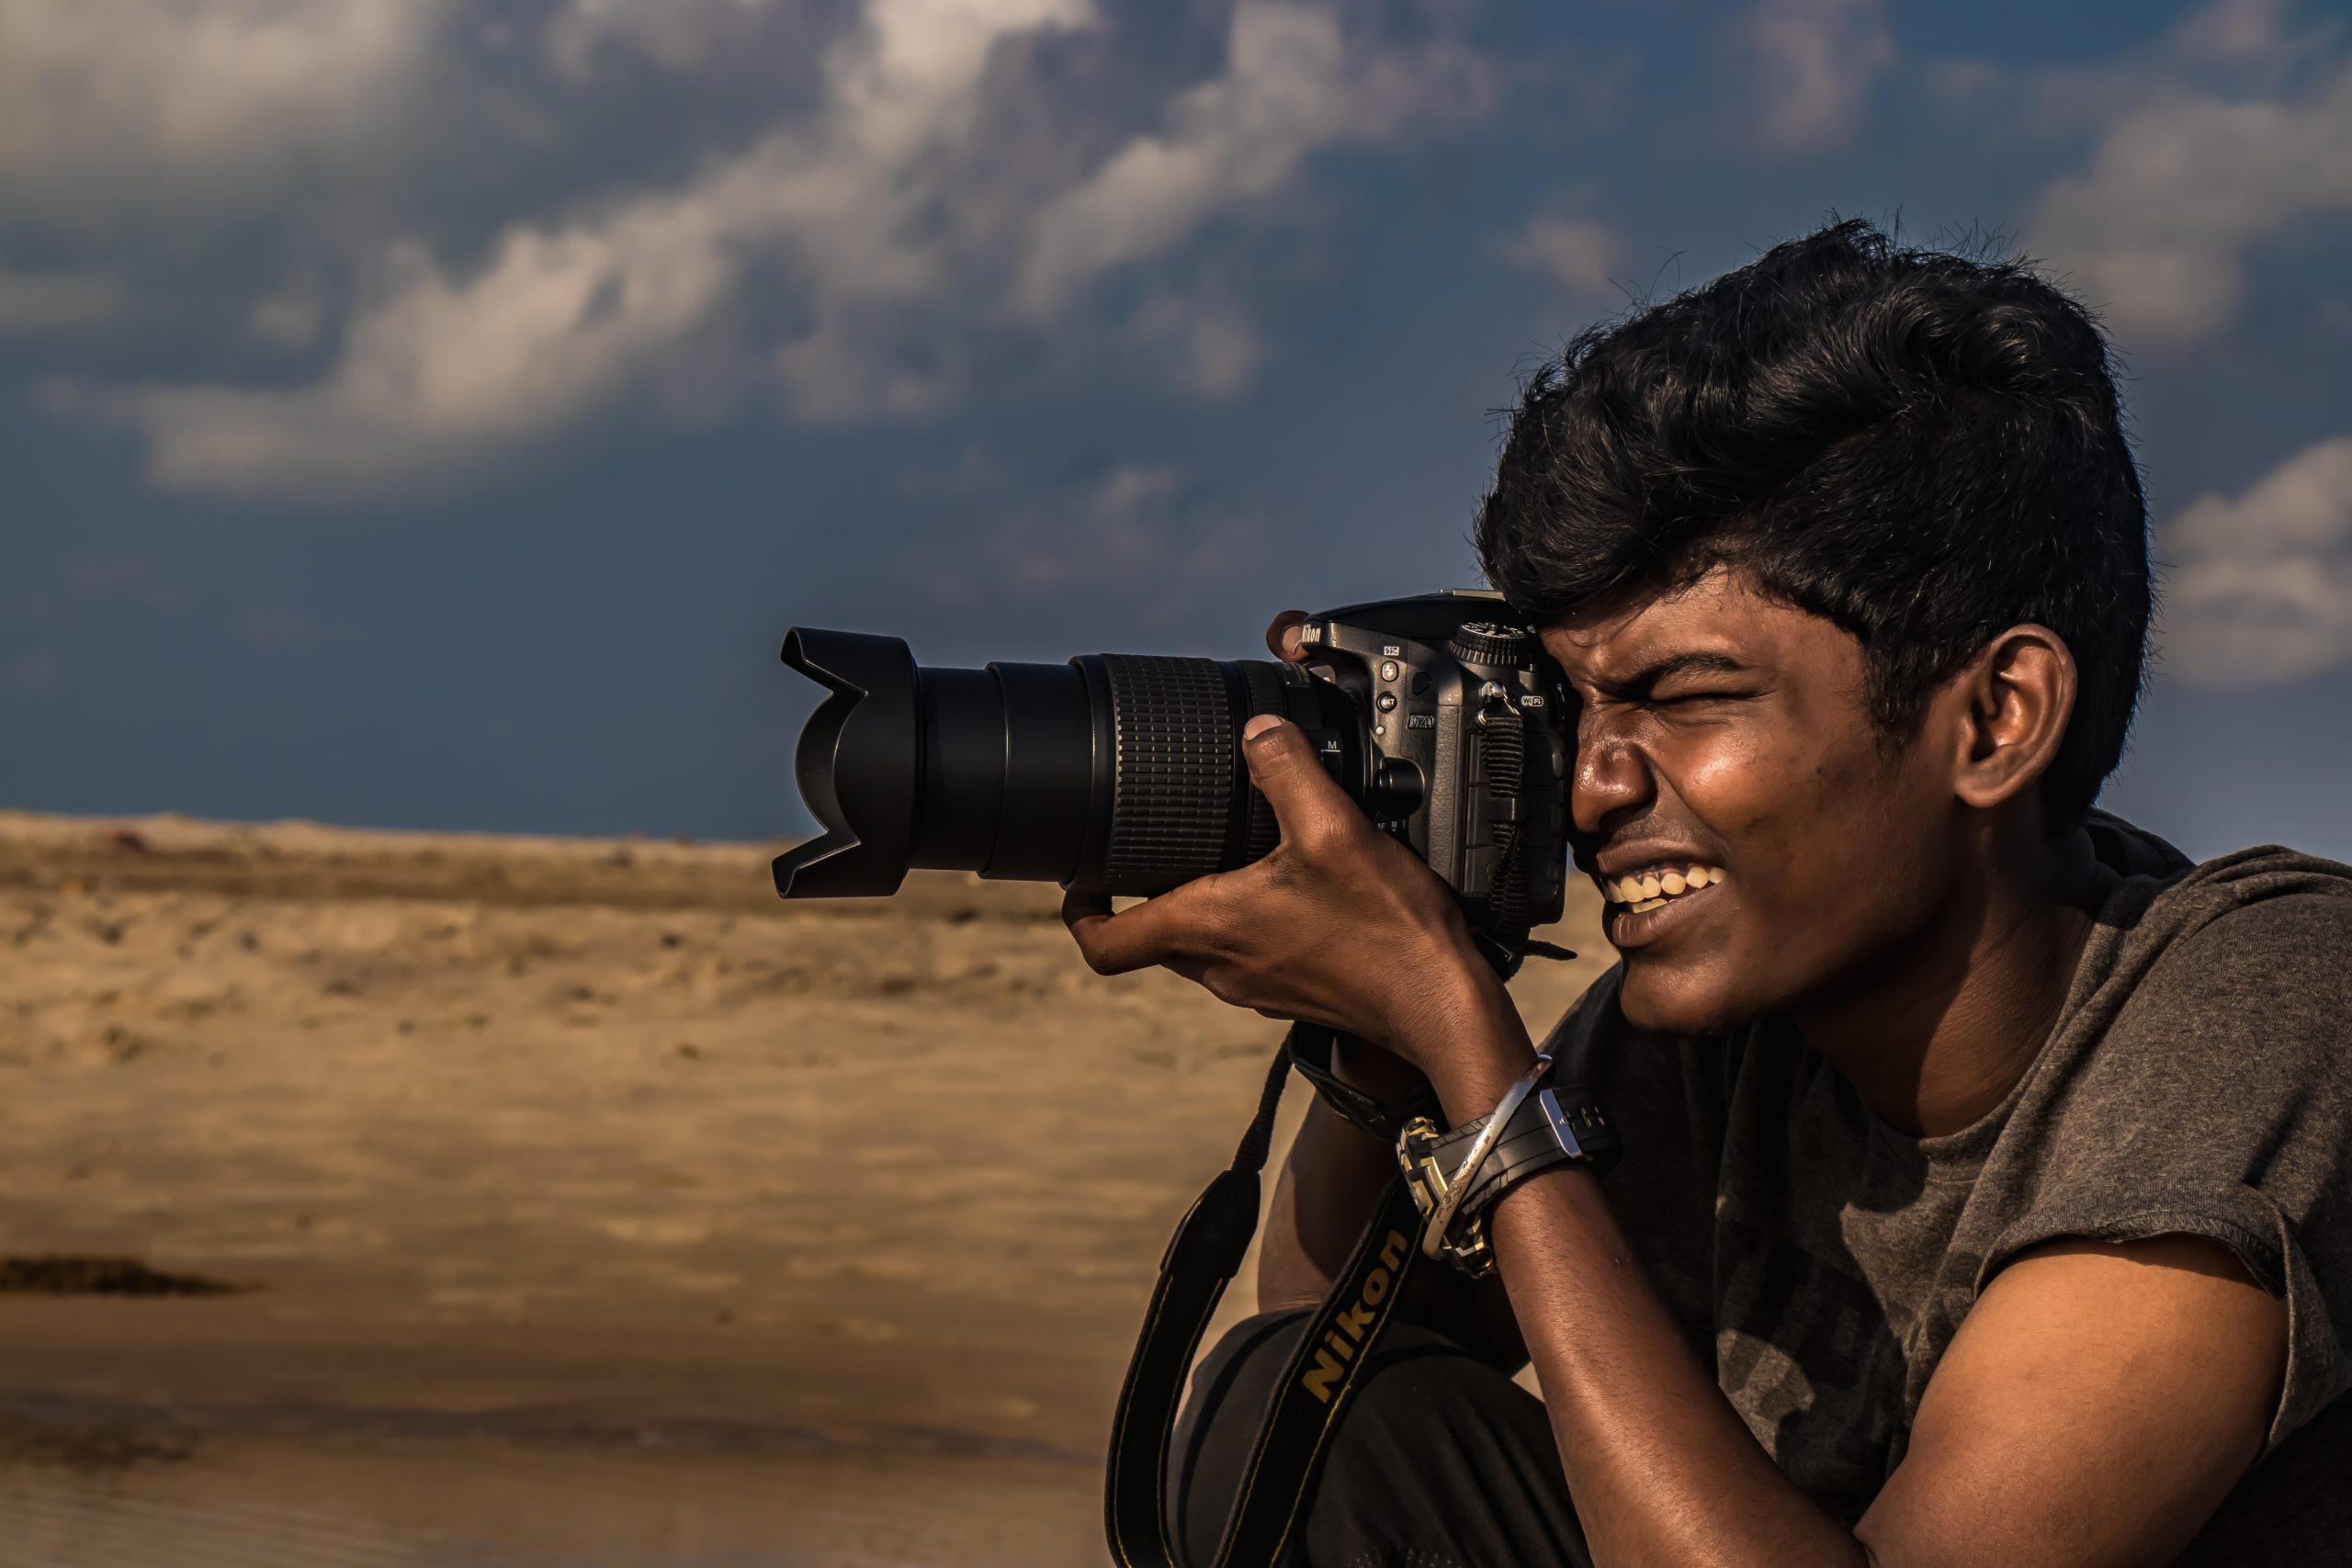 A photographer taking a shot